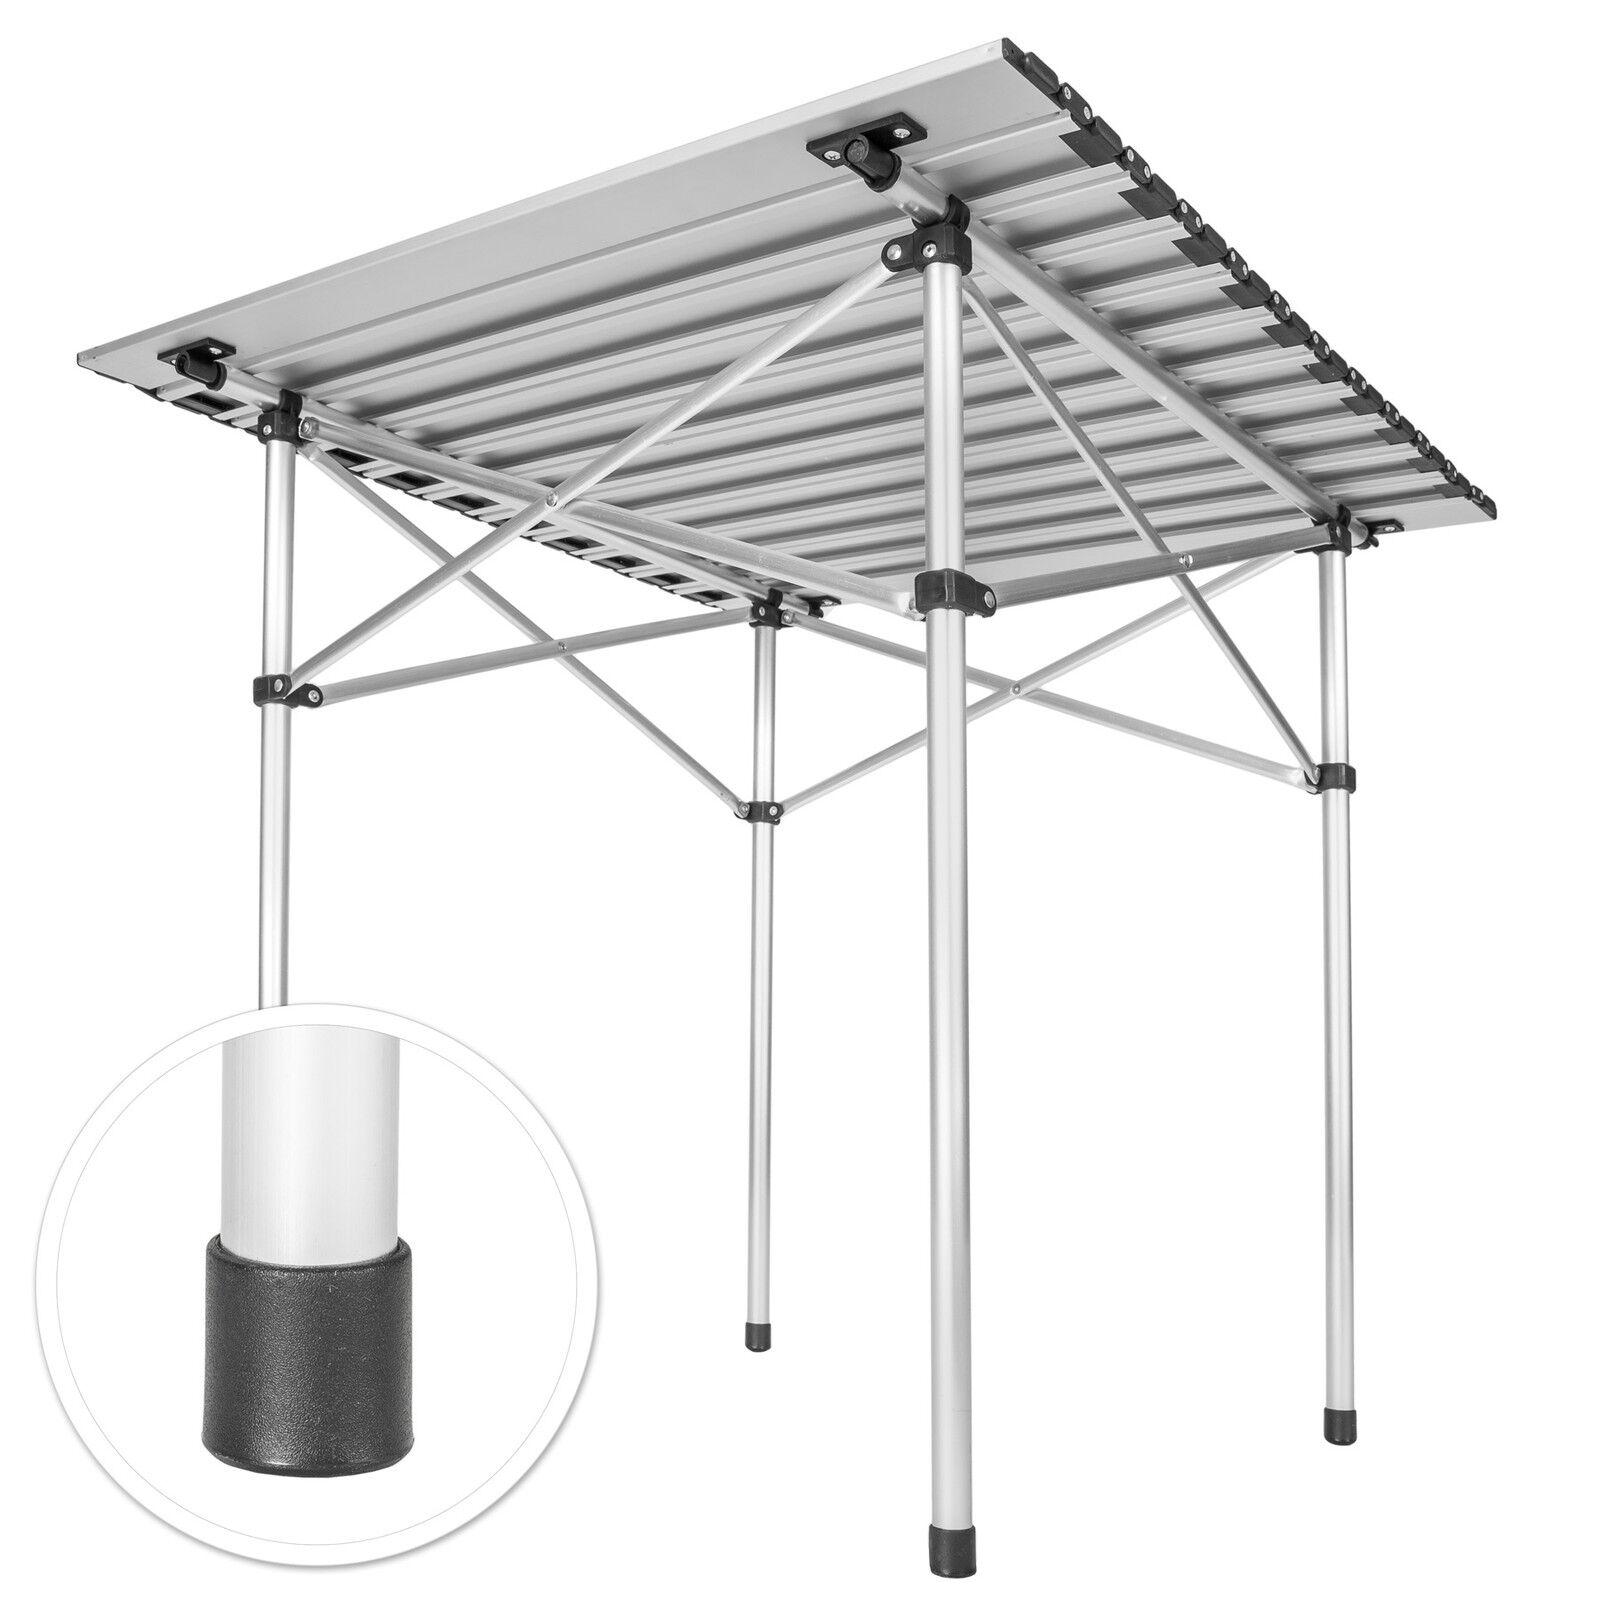 Aluminium campingtisch rolltisch klapptisch falttisch for Tavoli amazon